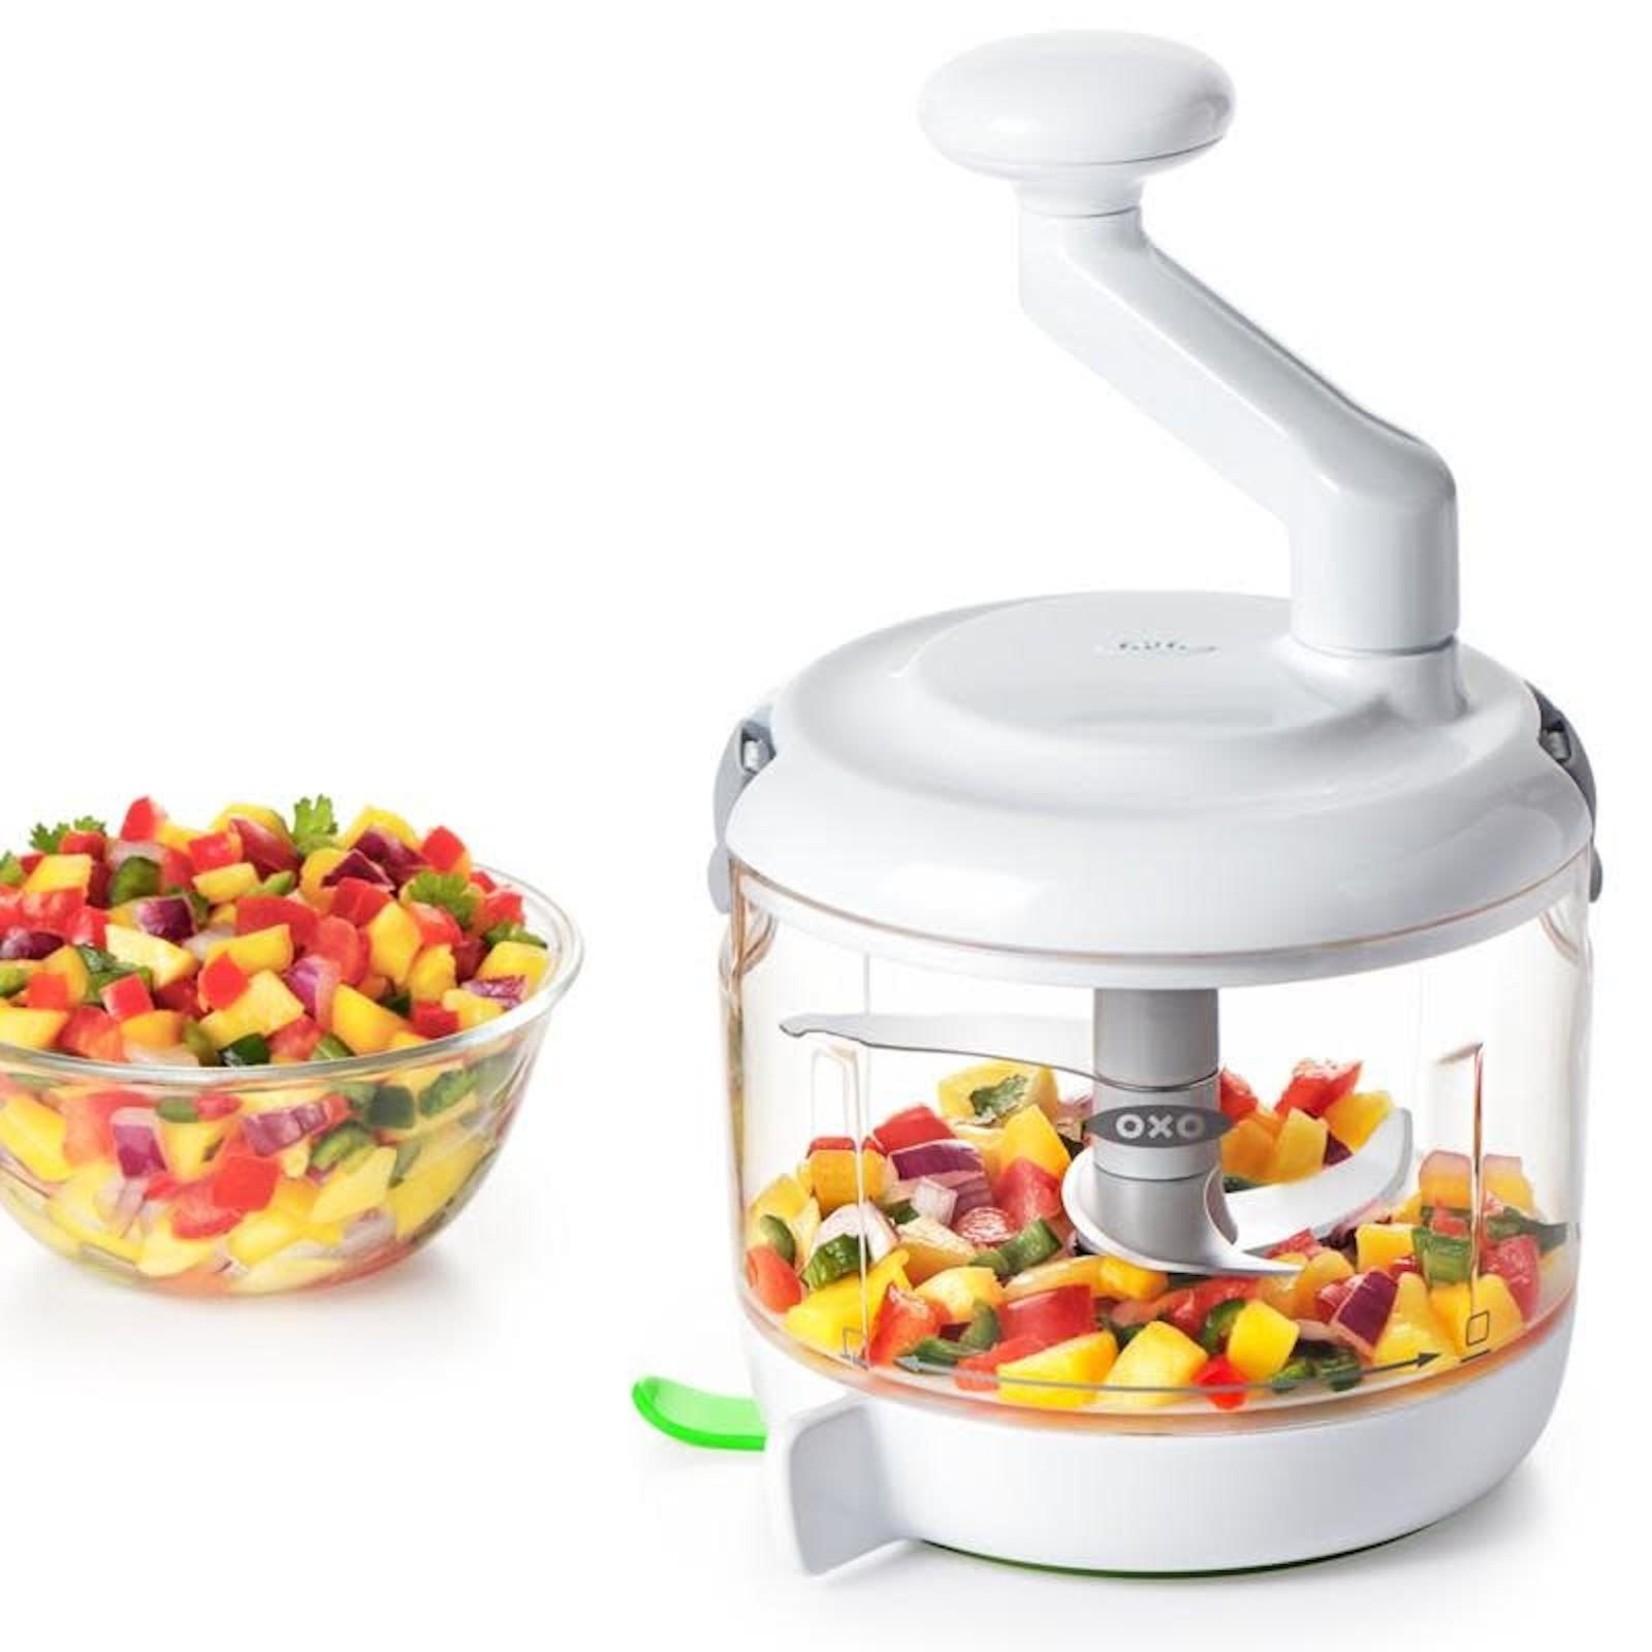 OXO Manual Food Processor